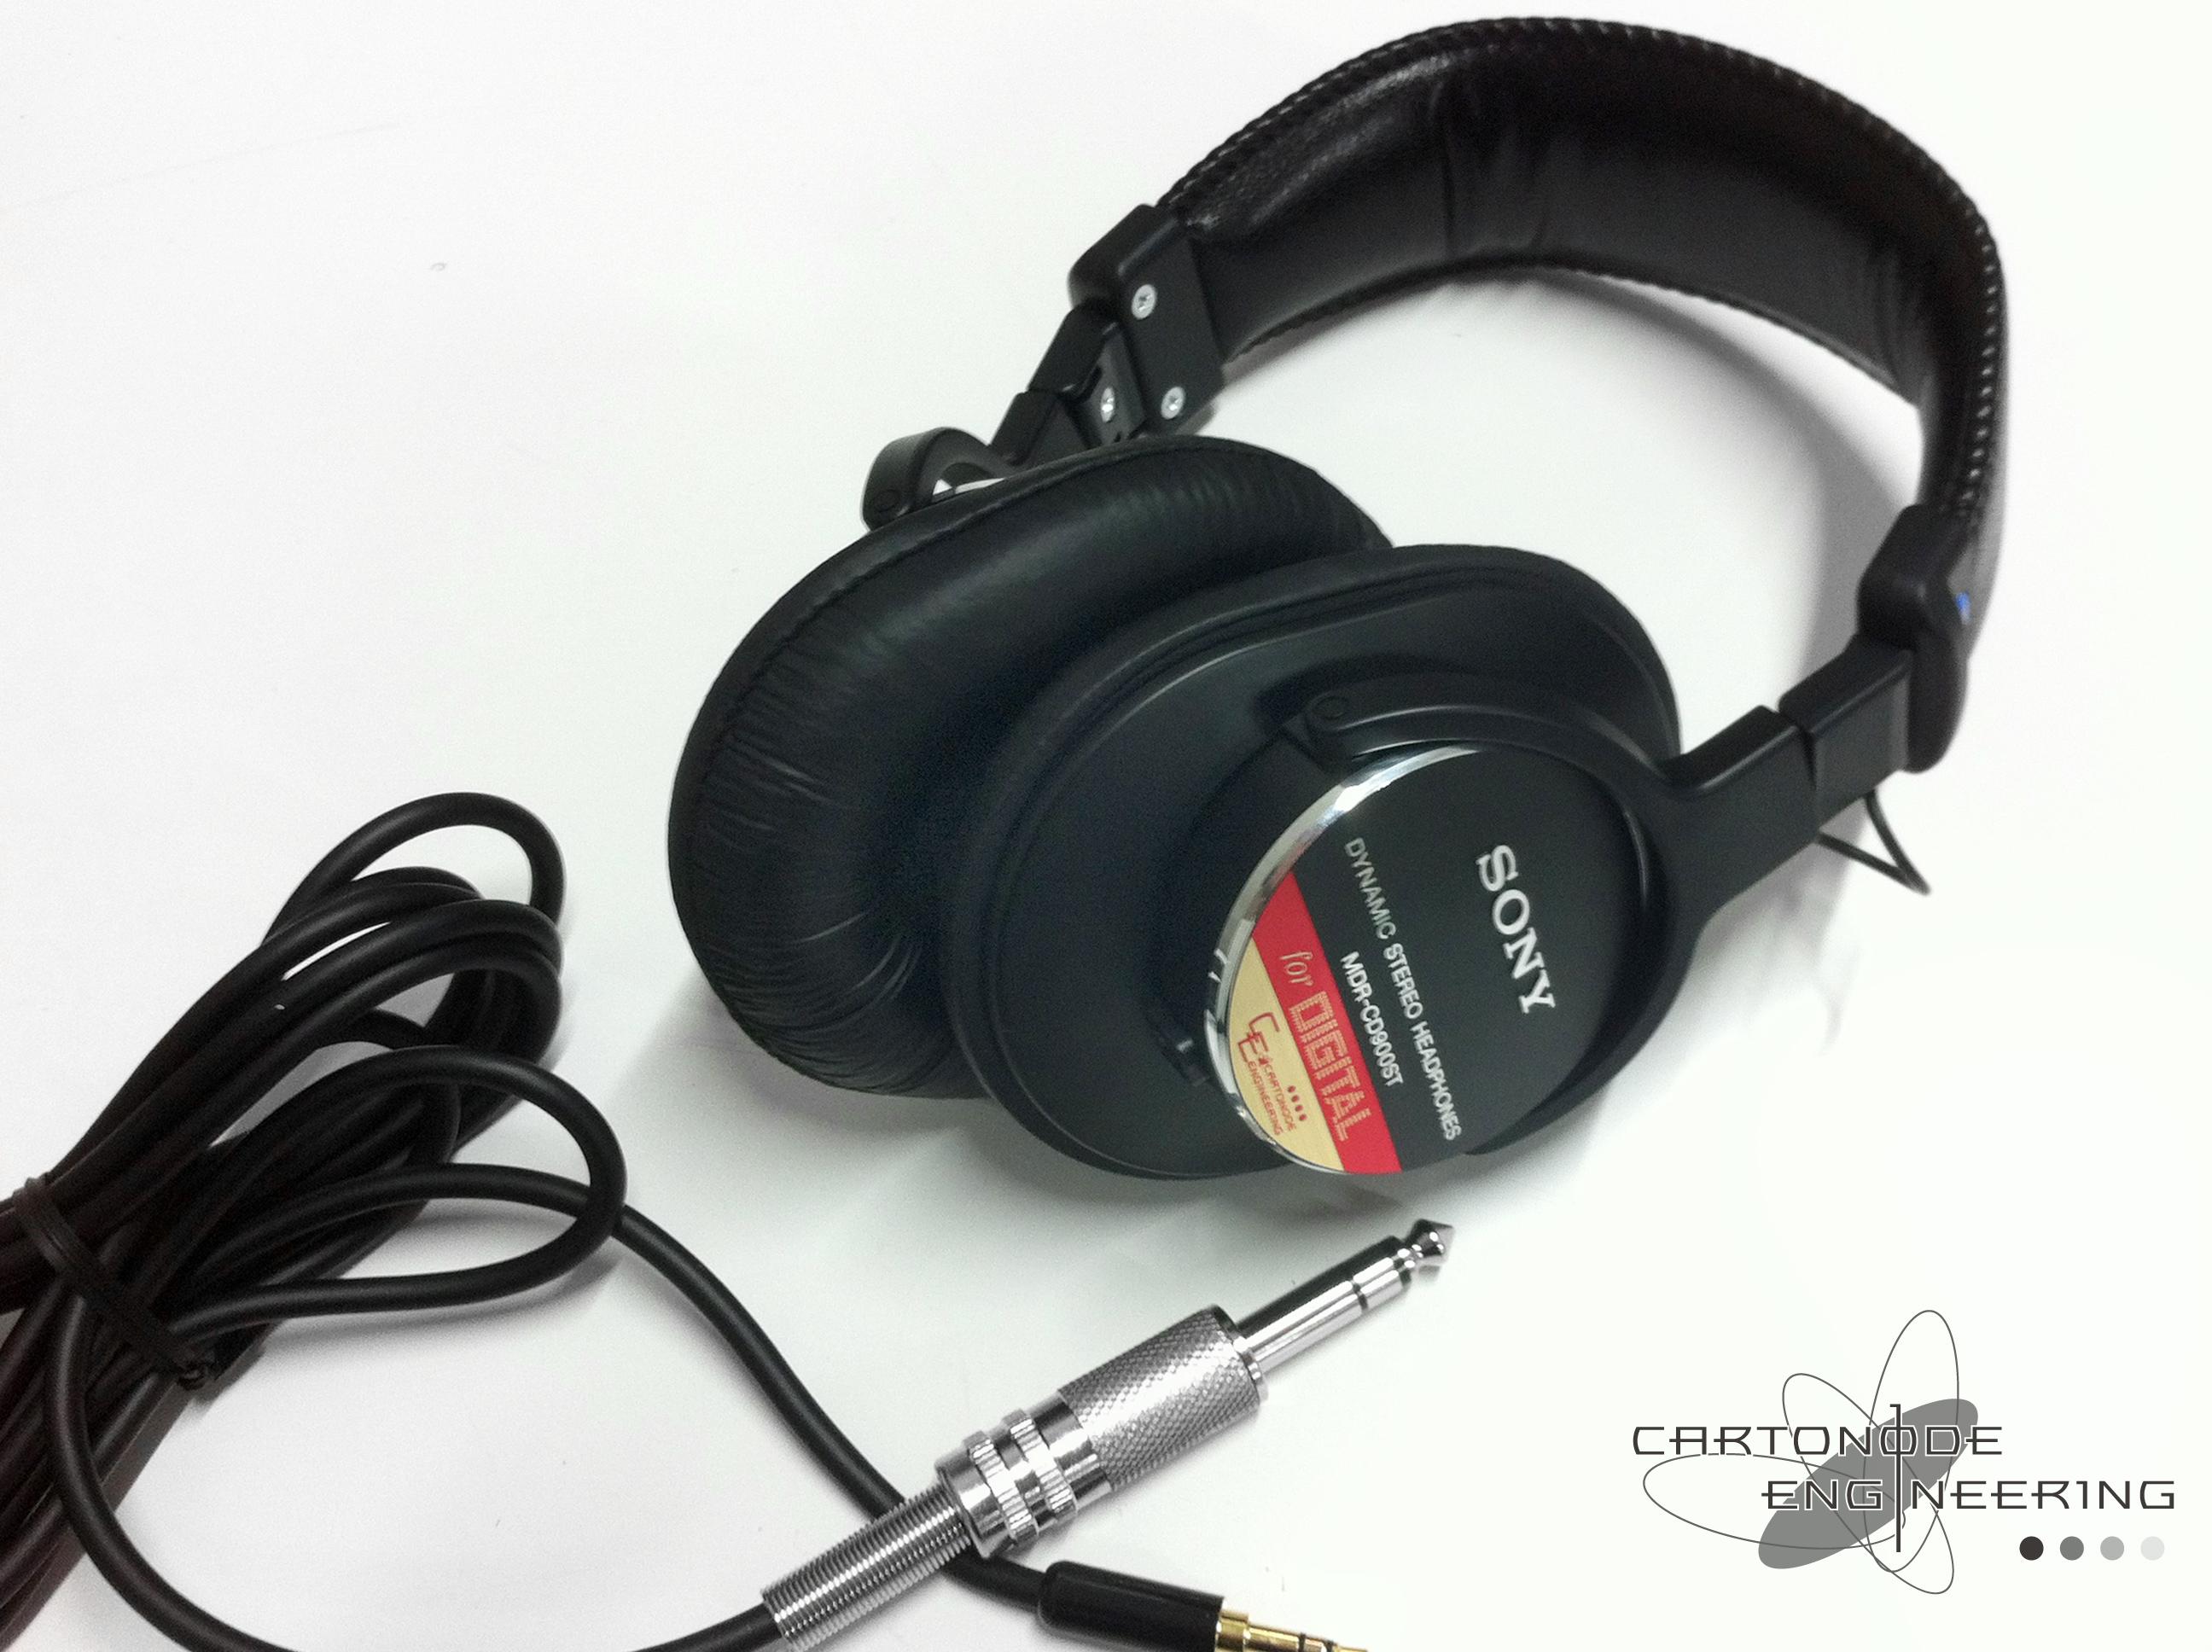 MDR-CD900STケーブル脱着カスタム